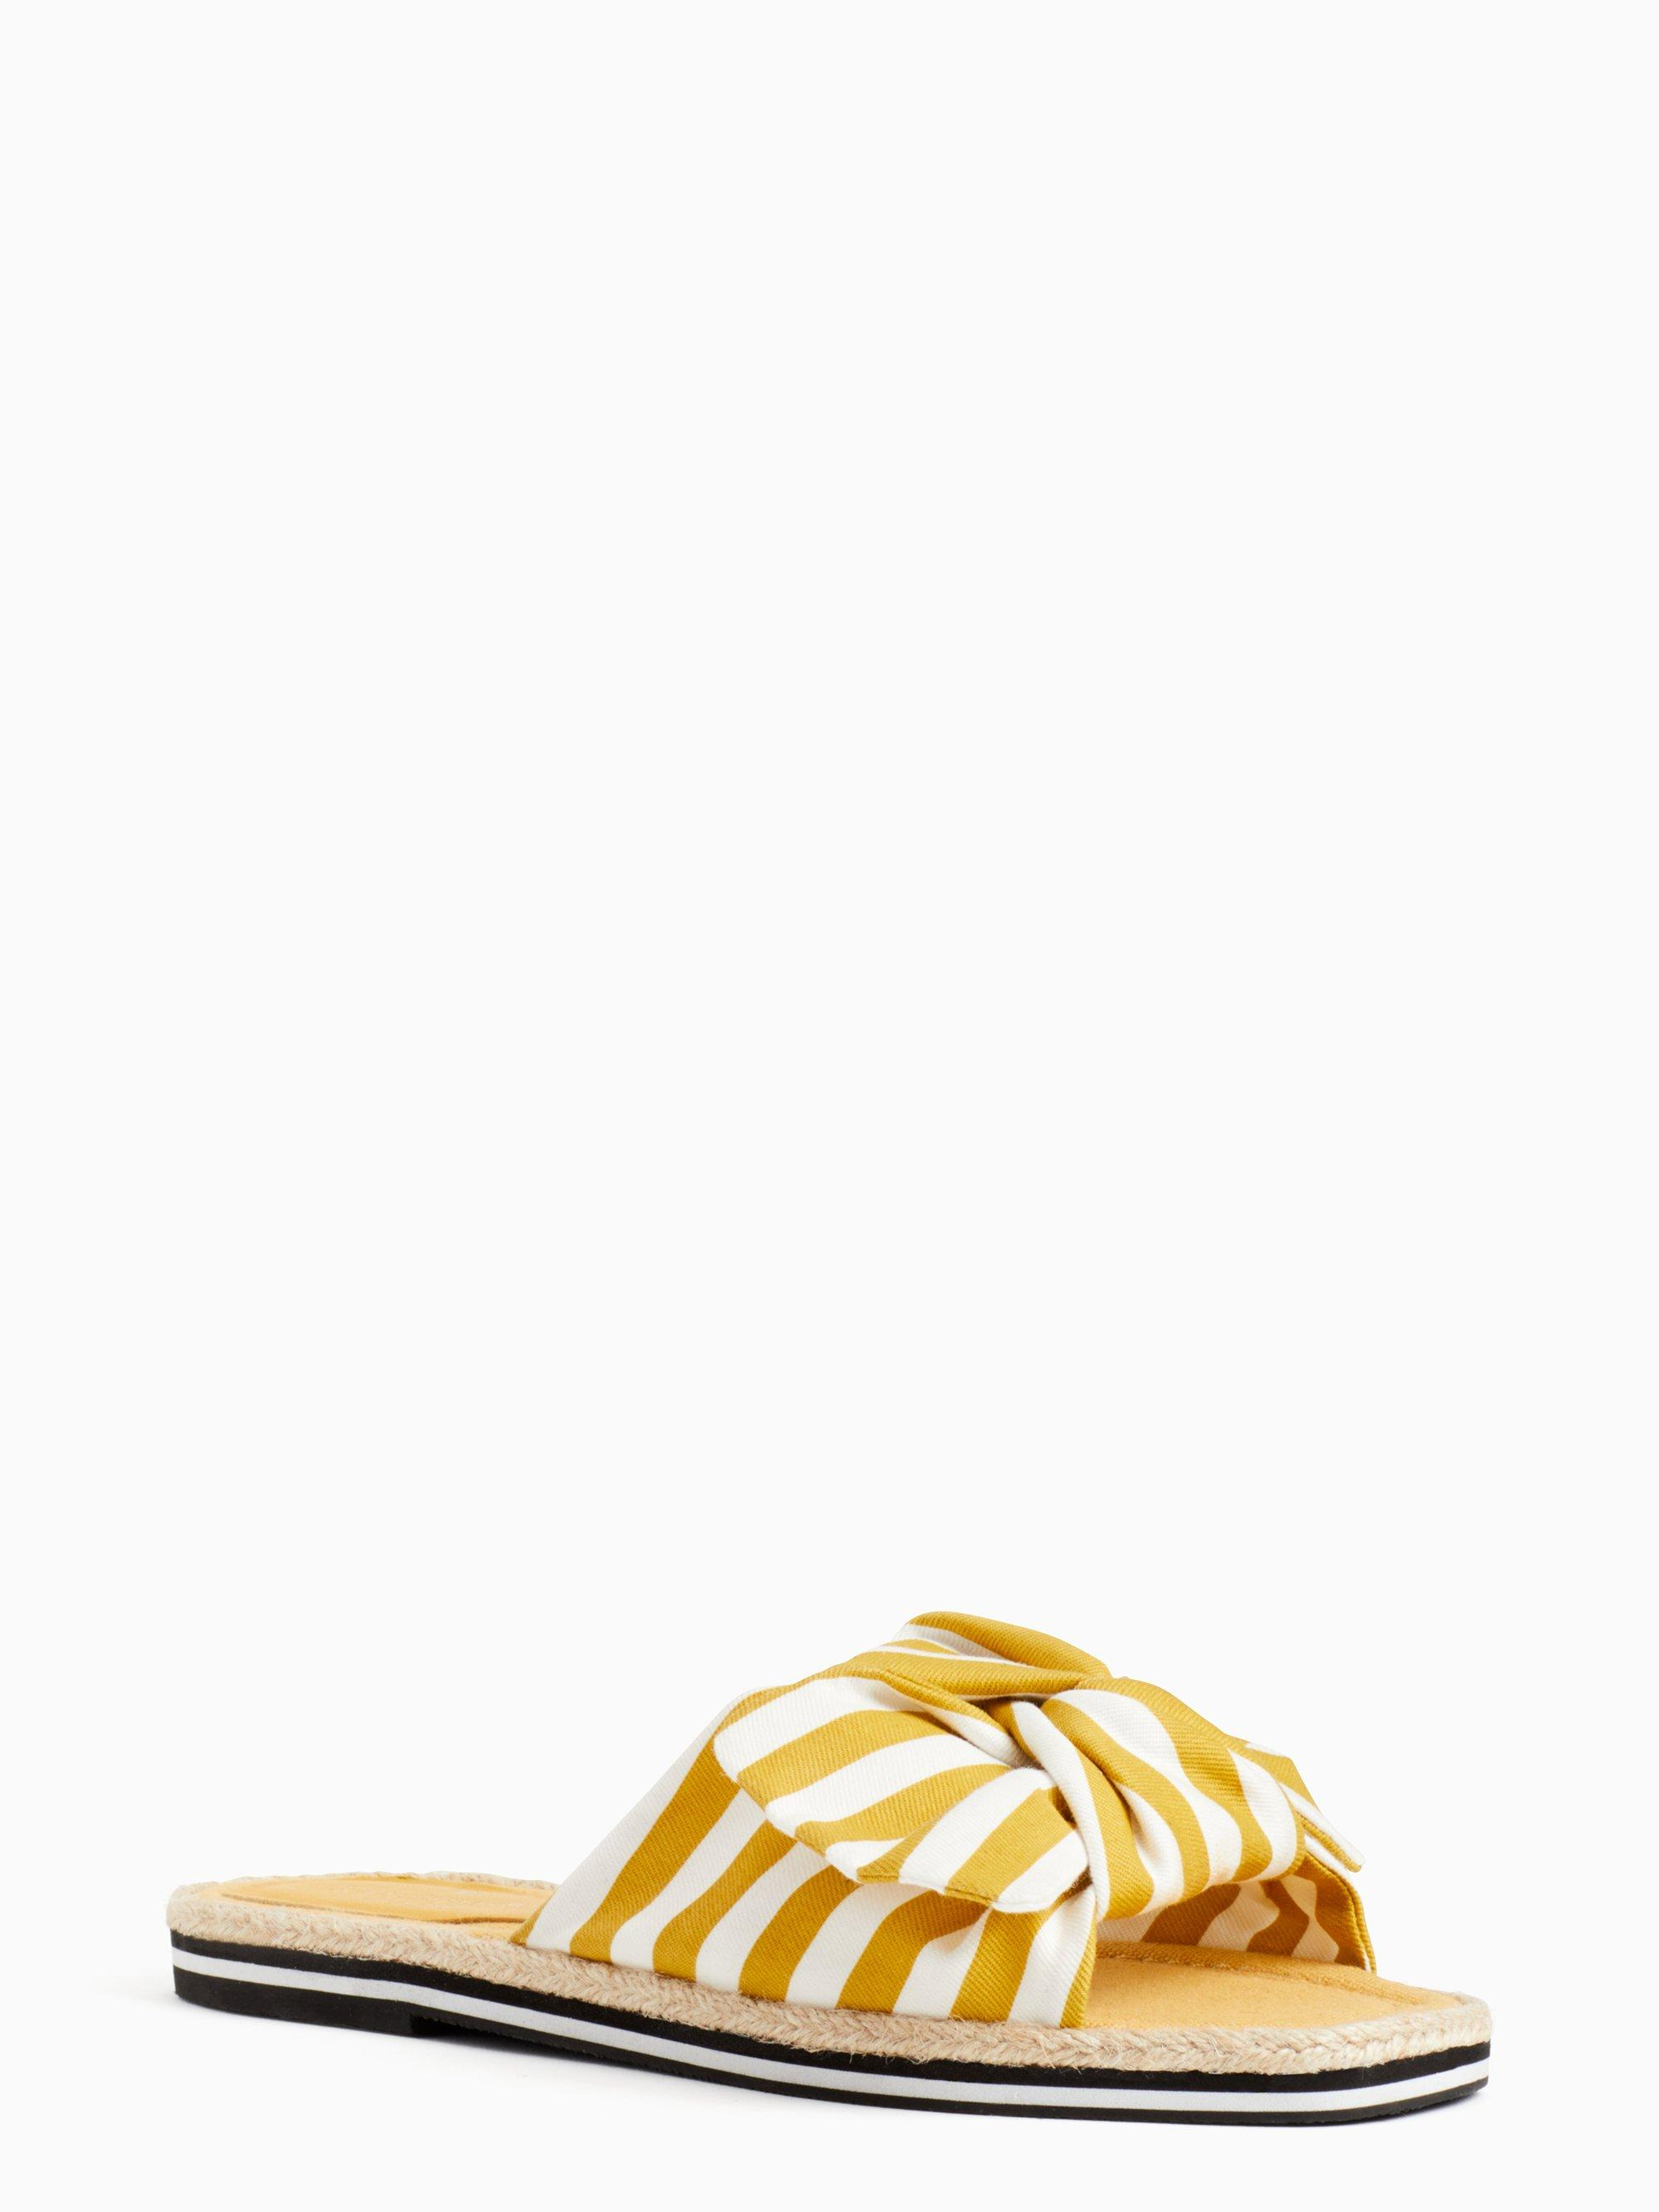 970a3730118 Lyst - Kate Spade Caliana Slide Sandals